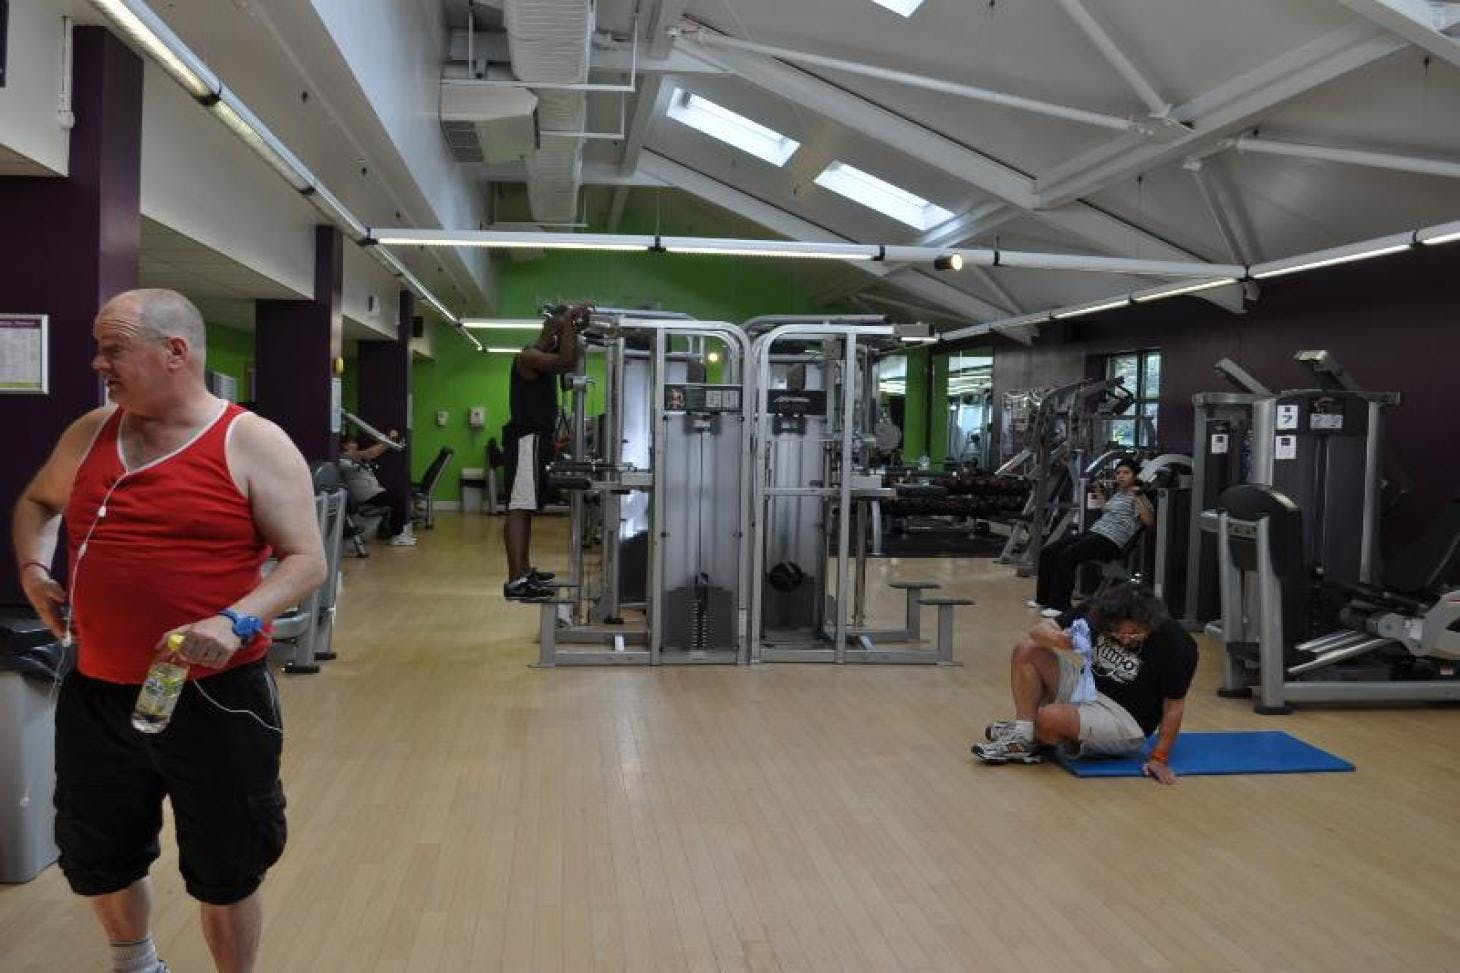 Highbury Pool and Gym Gym gym